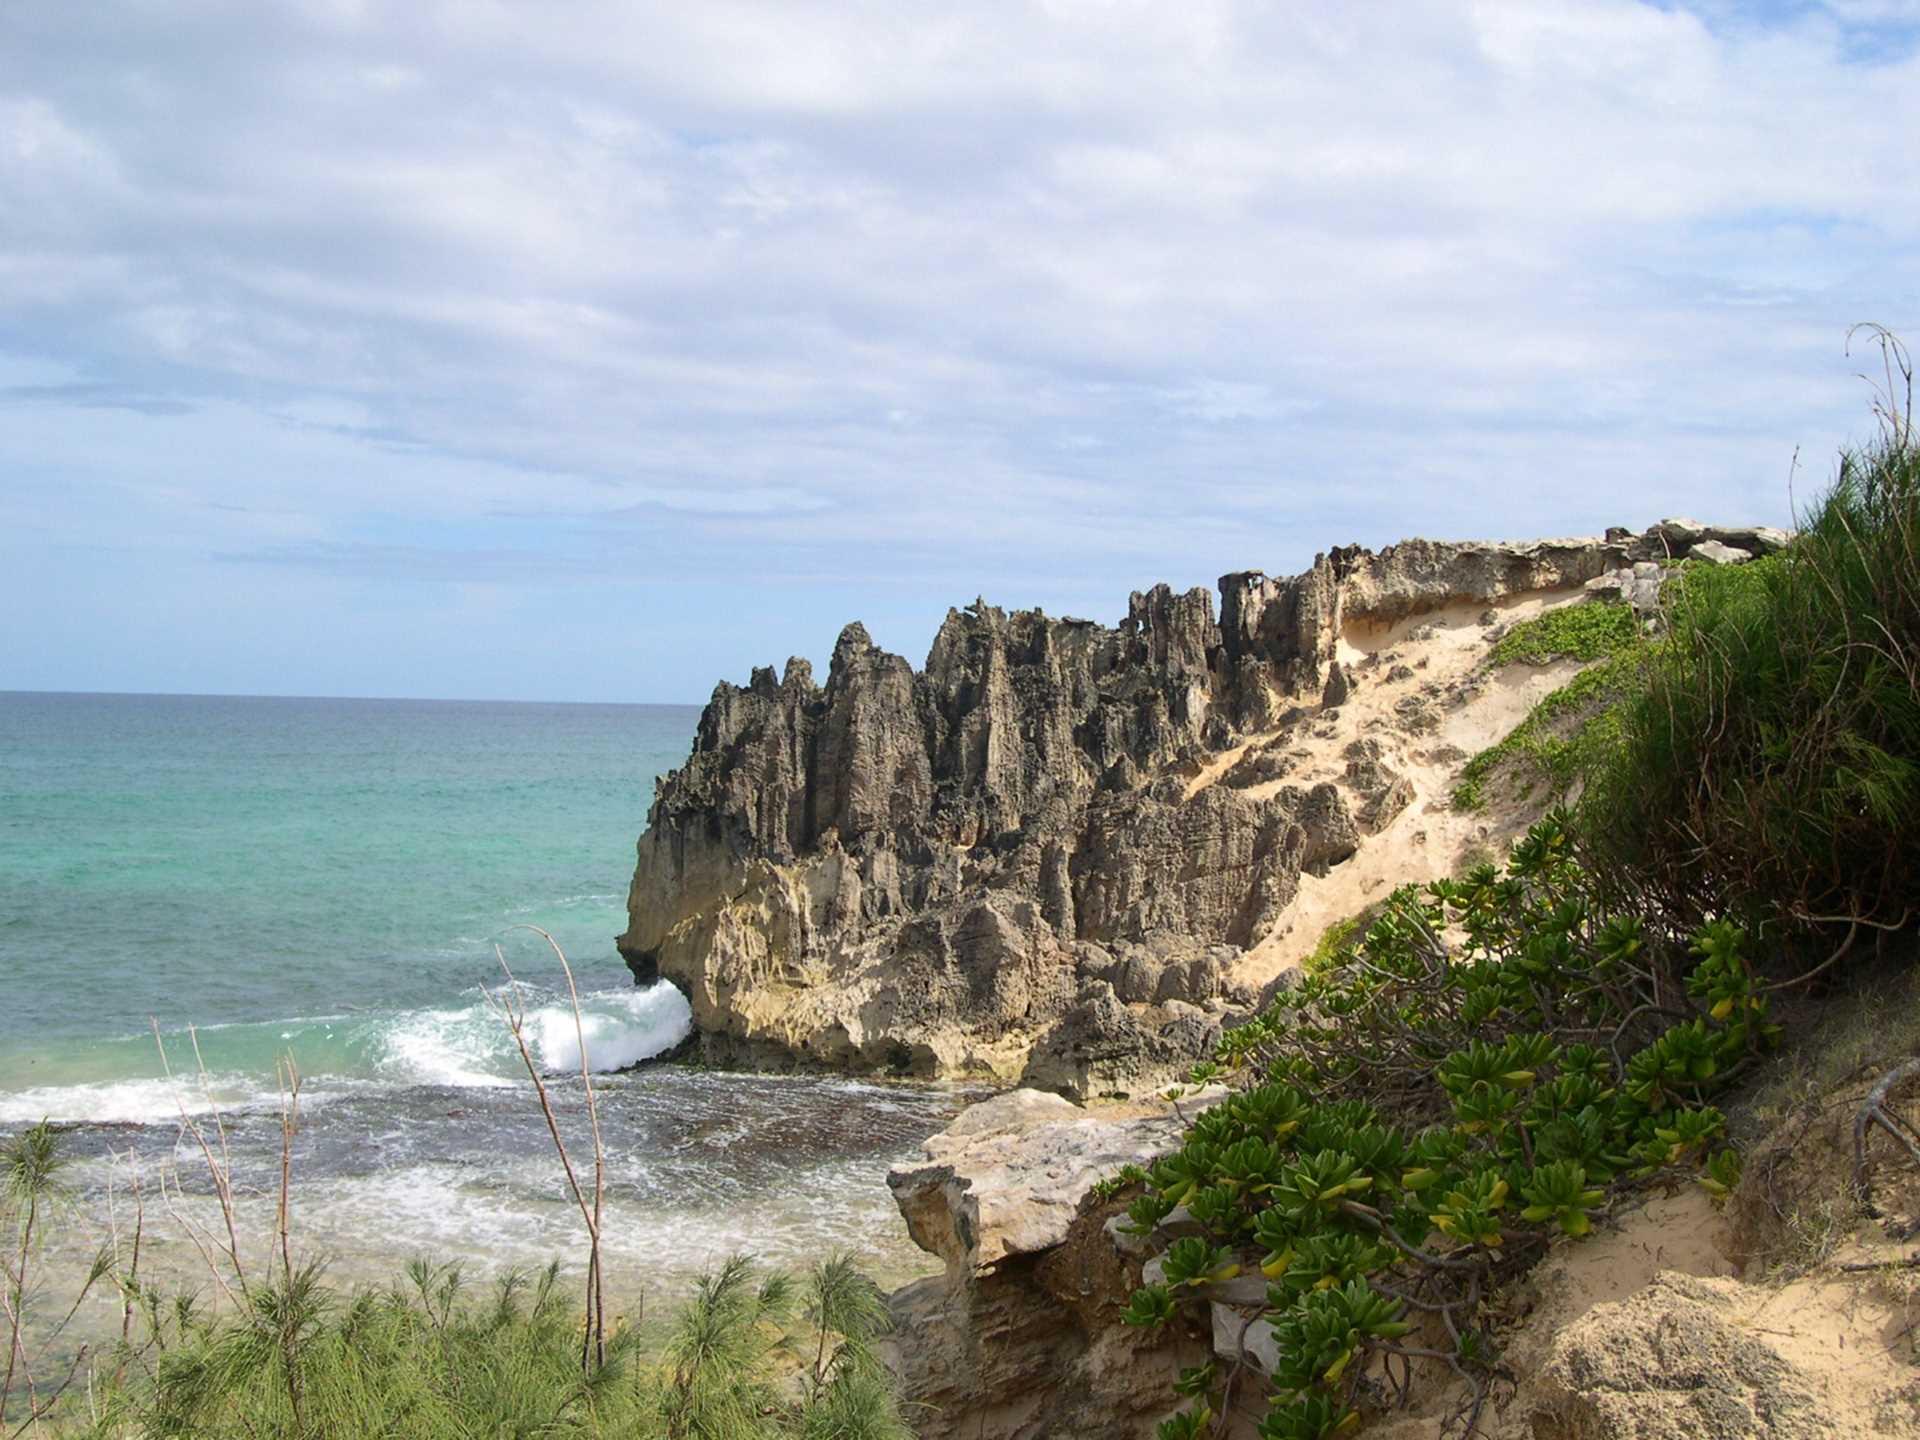 Lithified cliffs near Maha